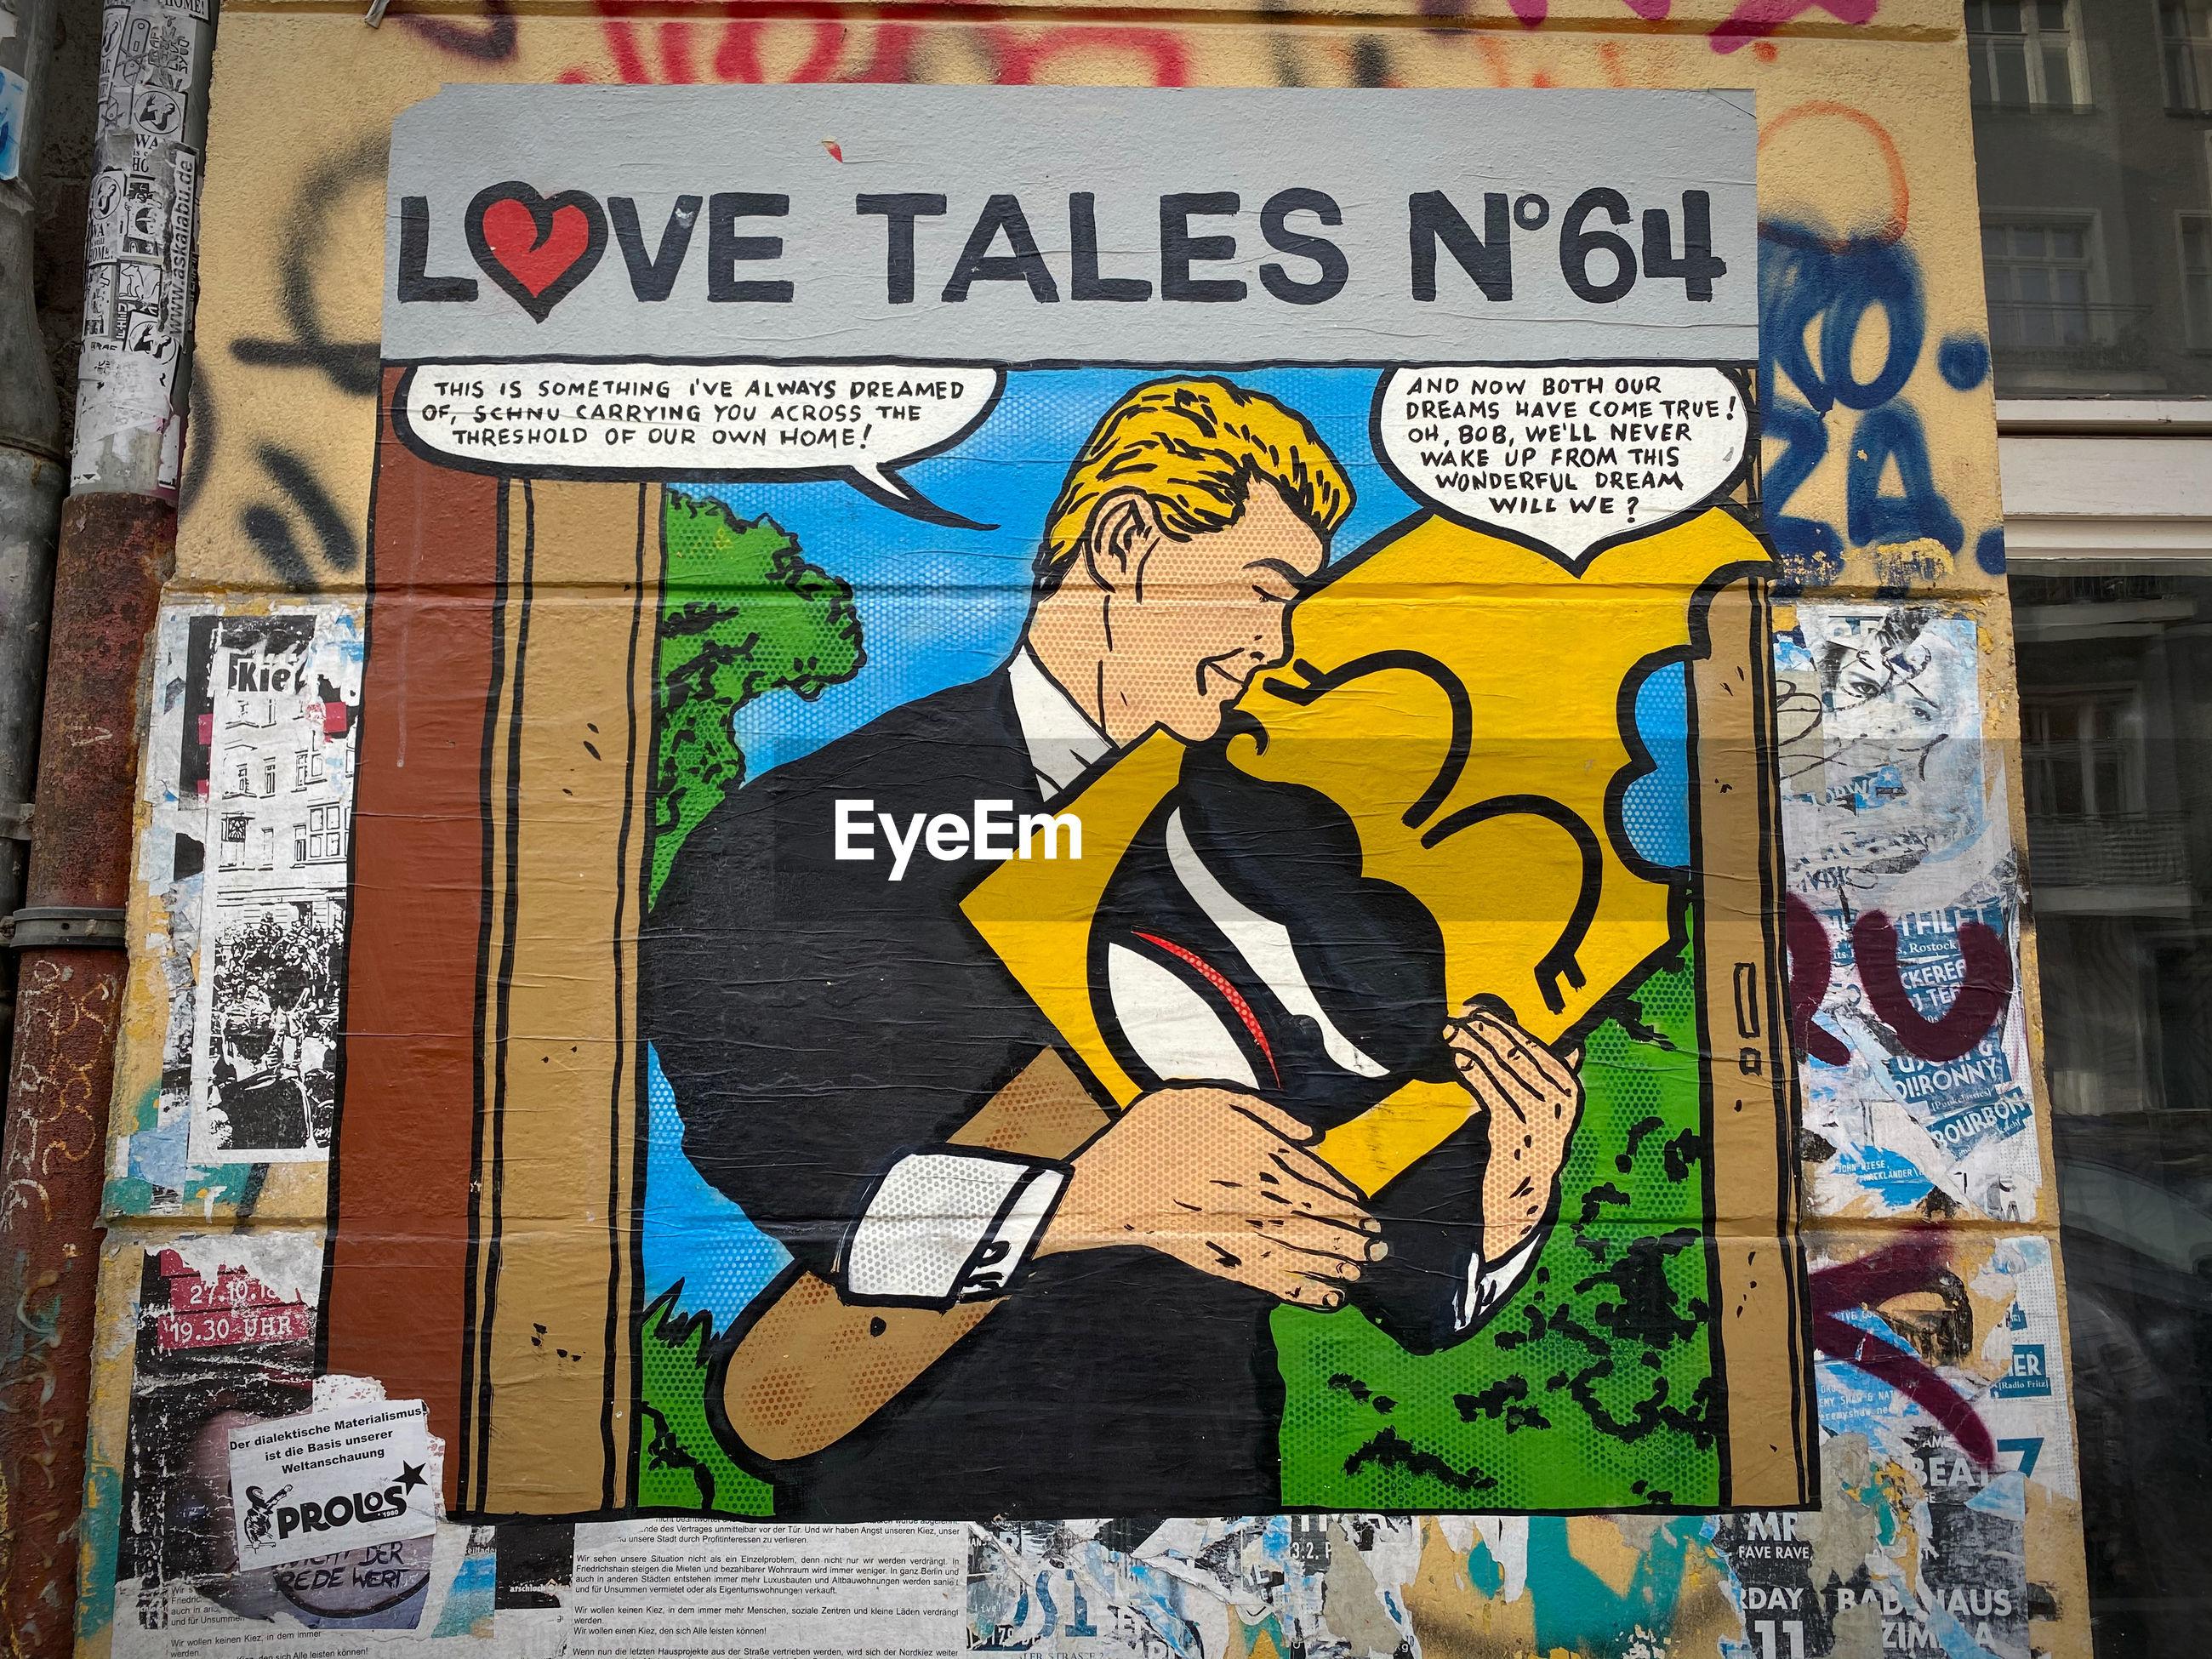 GRAFFITI ON BRICK WALL WITH TEXT